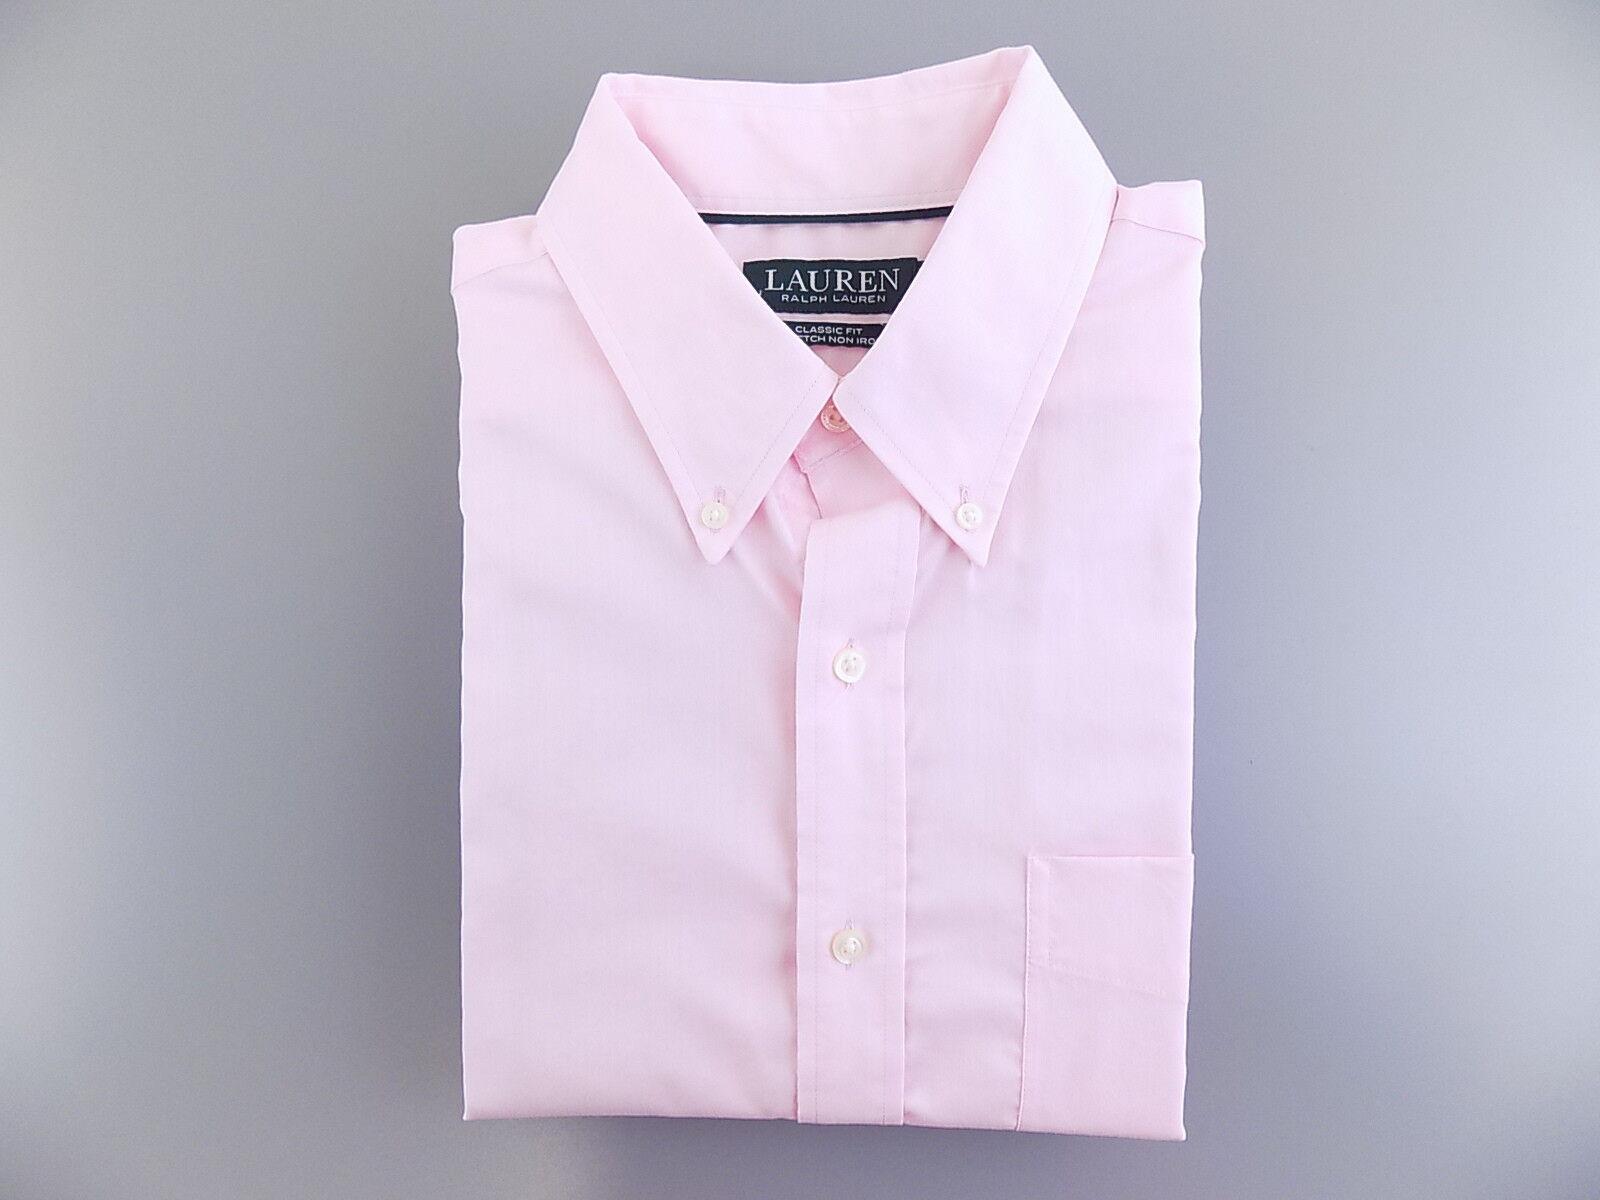 POLO RALPH LAUREN  Pink 16 x 32 33 Classic Fit MEN DRESS SHIRT NON IRON  L21